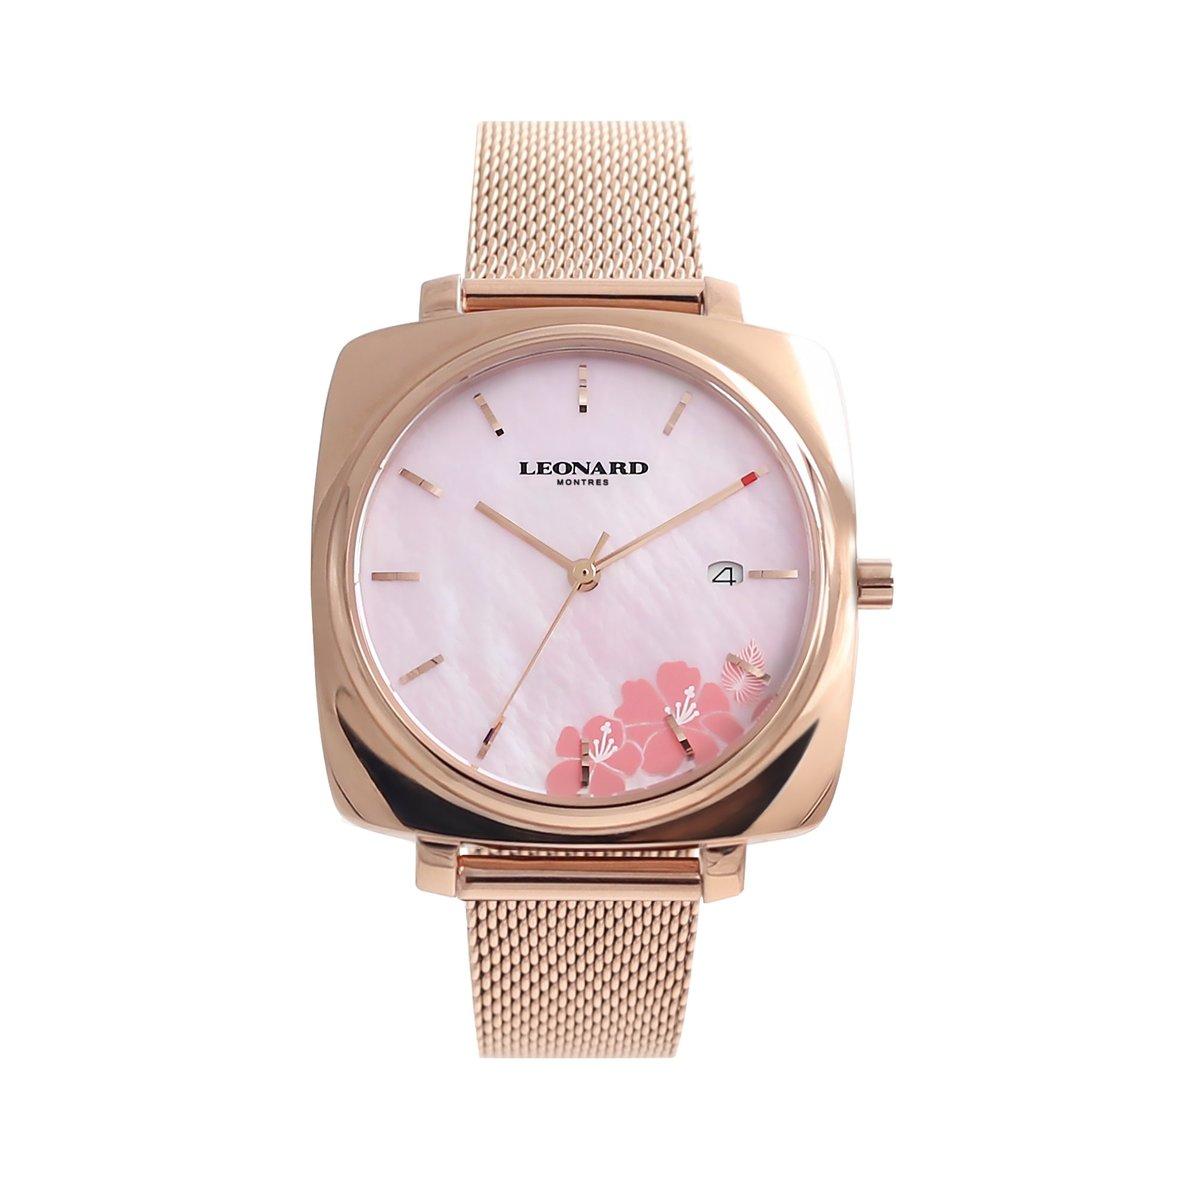 La mode Cushion Watches LLF1018-16R